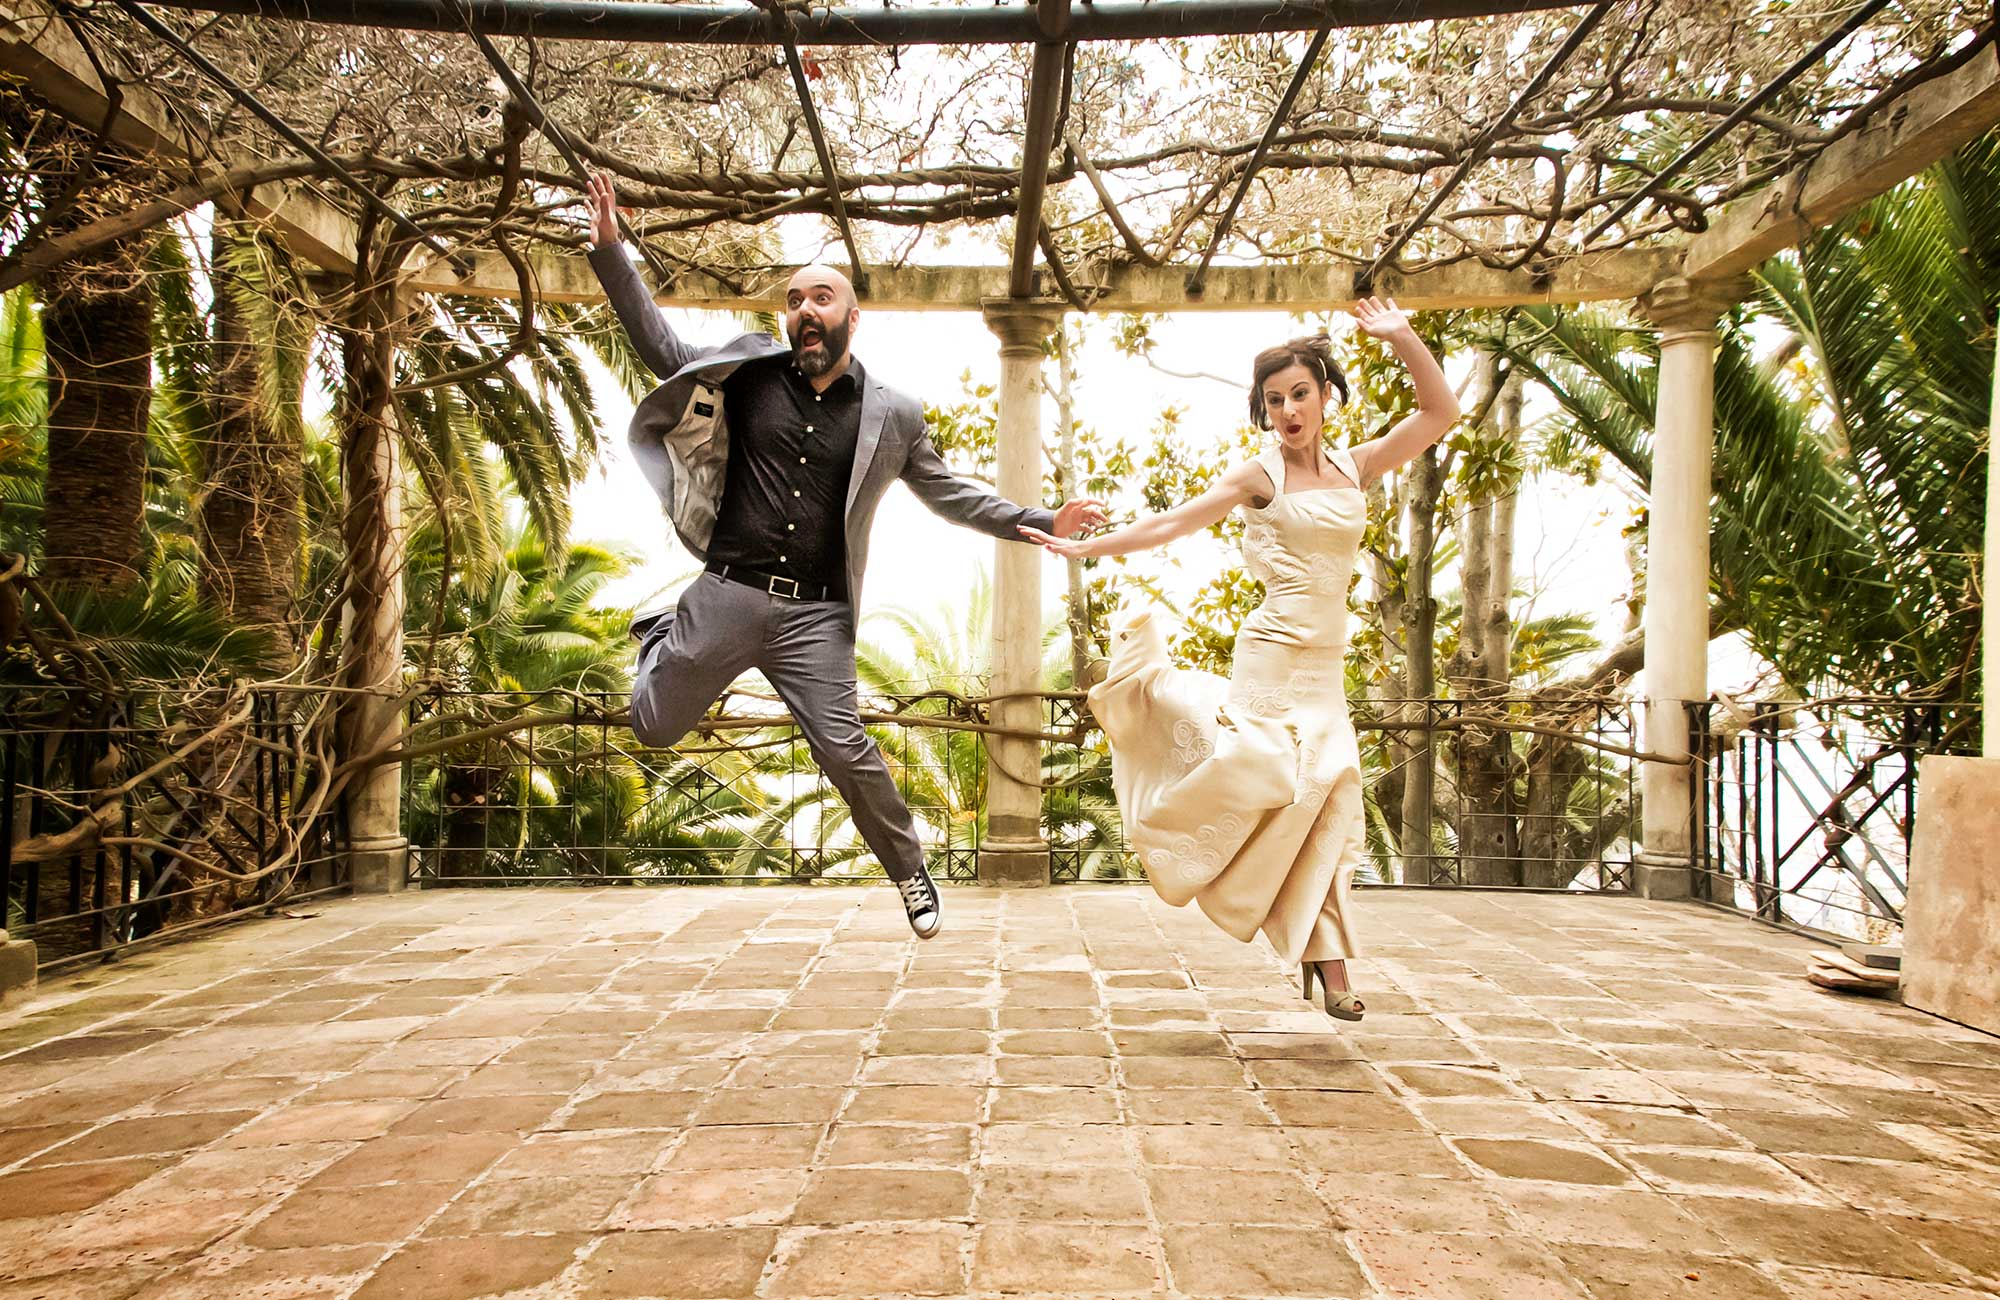 0001 Fotografo bodas Malaga - Juan Justo